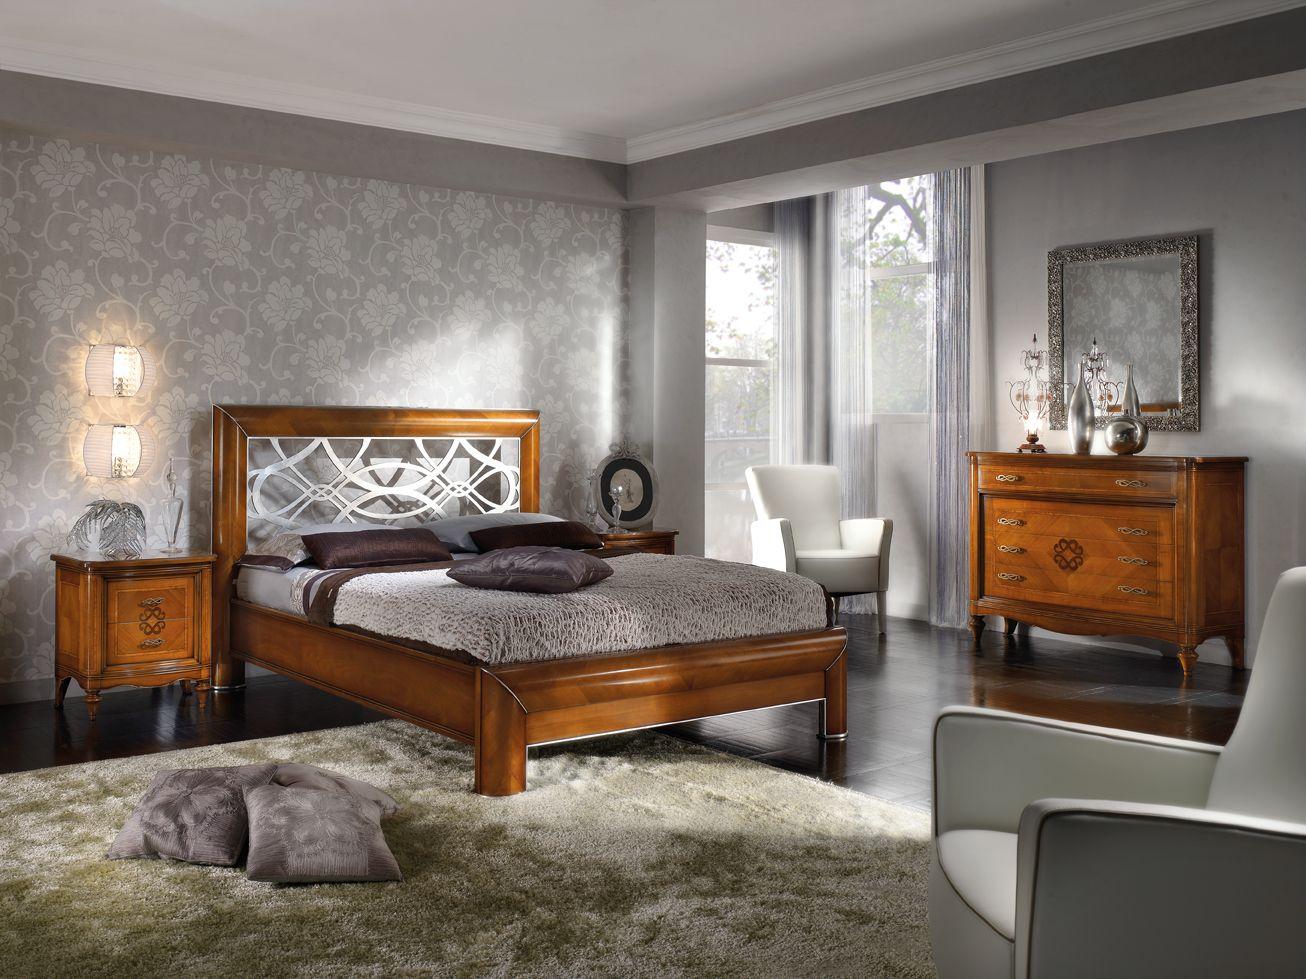 www,cordelsrl.com   #elegant #romantic #bed